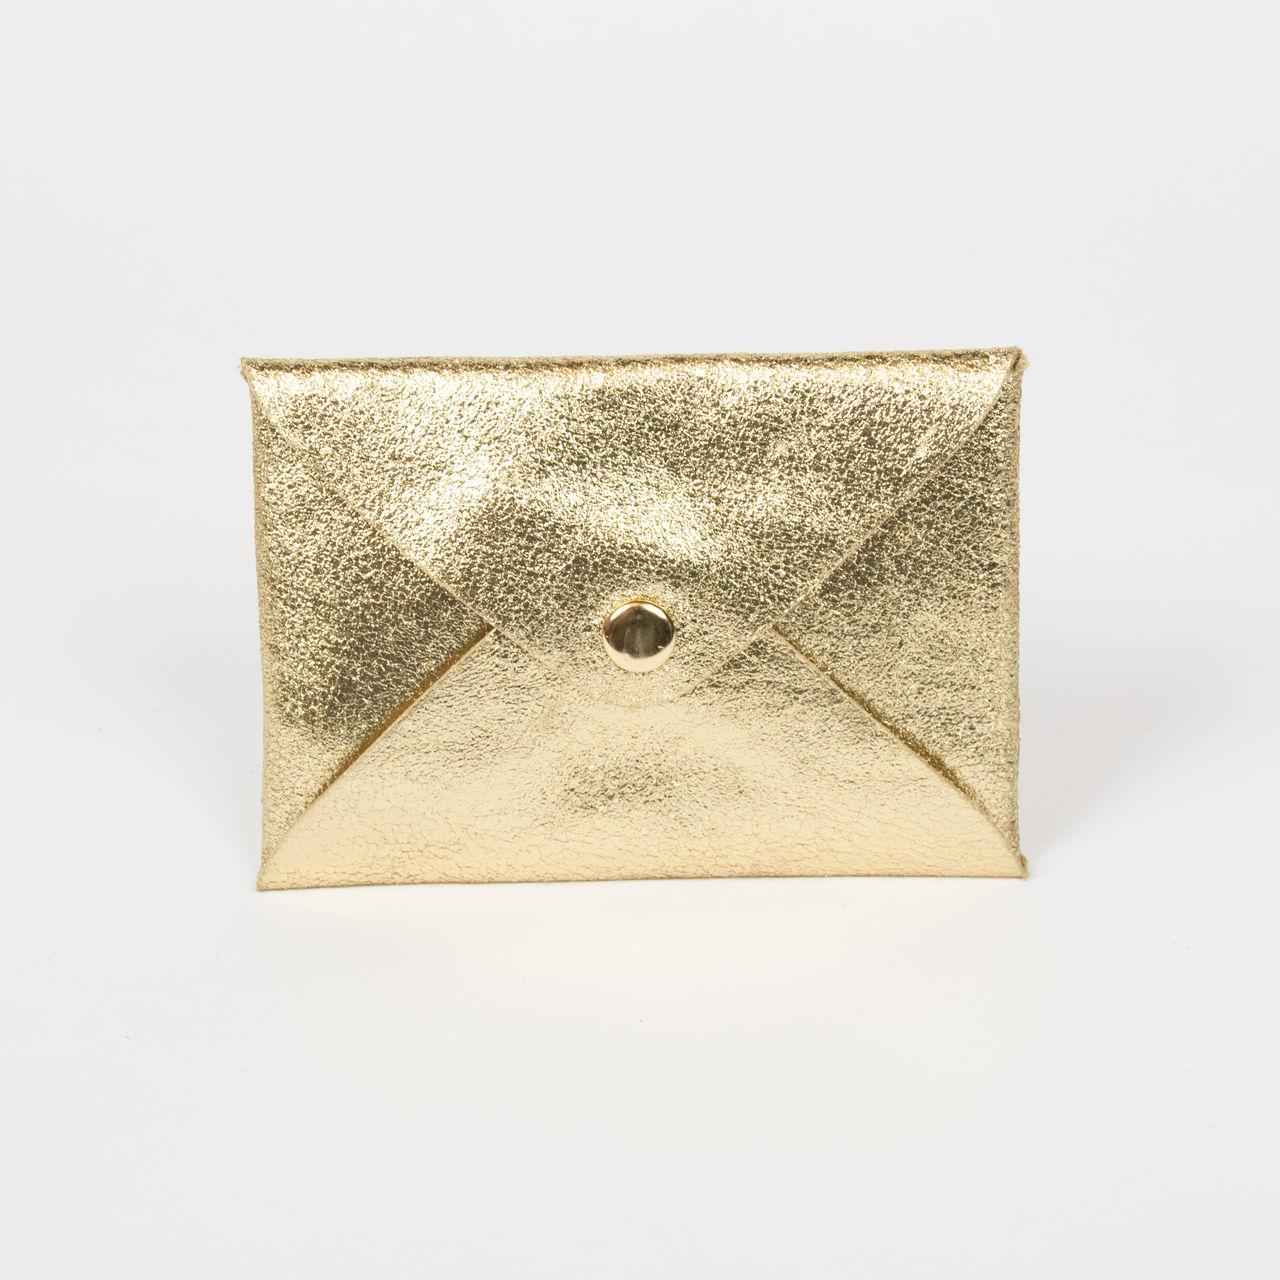 boutique la femme bagagerie petite maroquinerie porte carte petite mendigote. Black Bedroom Furniture Sets. Home Design Ideas